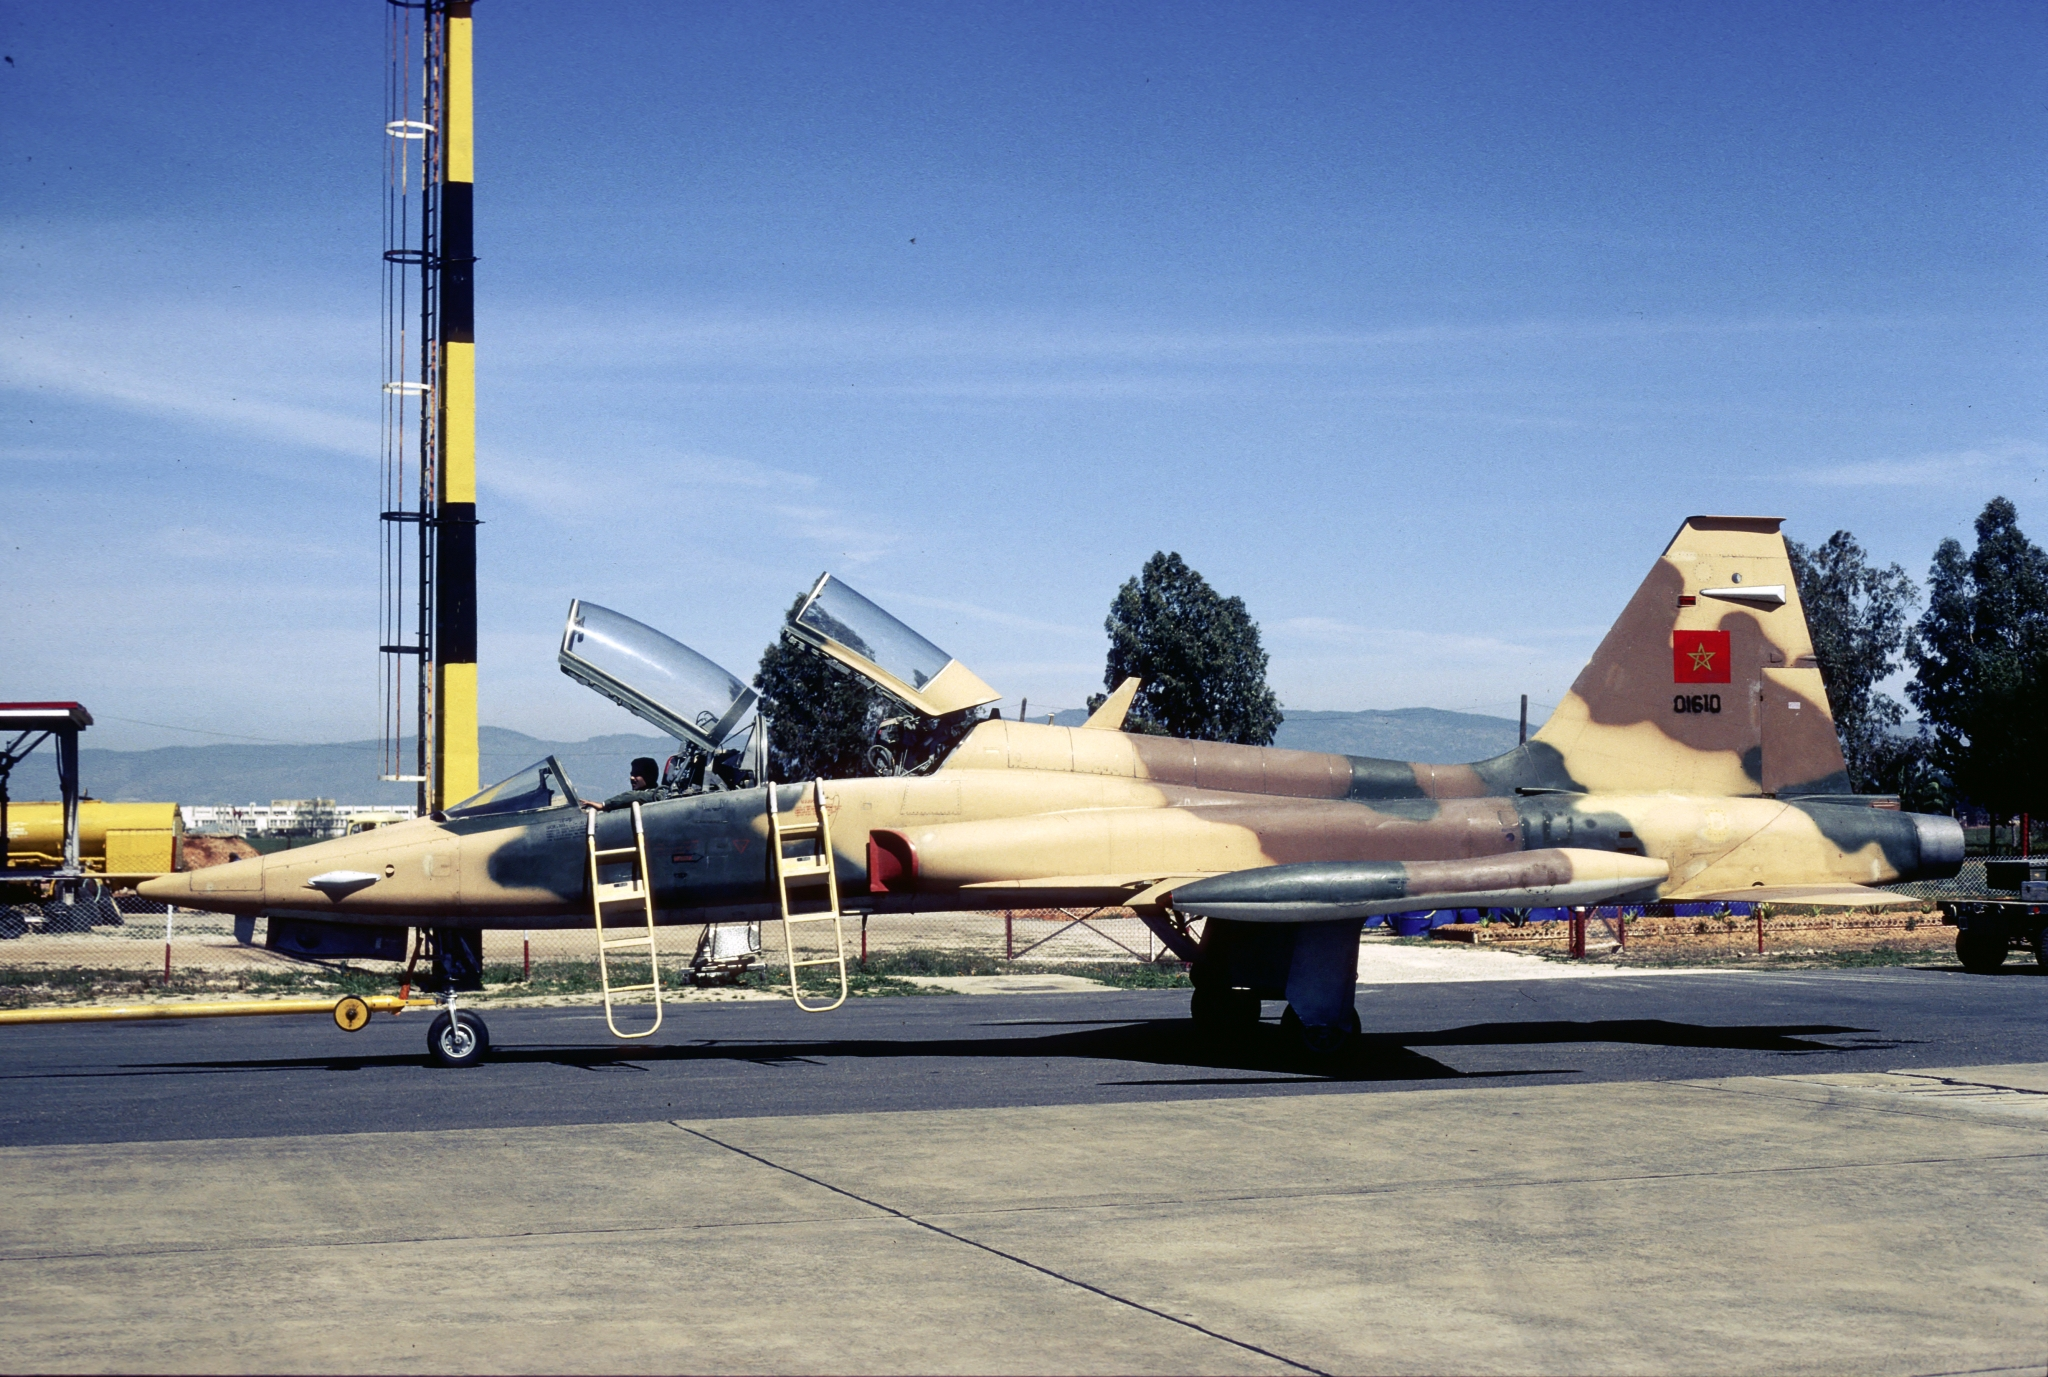 FRA: Photos anciens avions des FRA - Page 11 31665244917_7a5ac79bc0_o